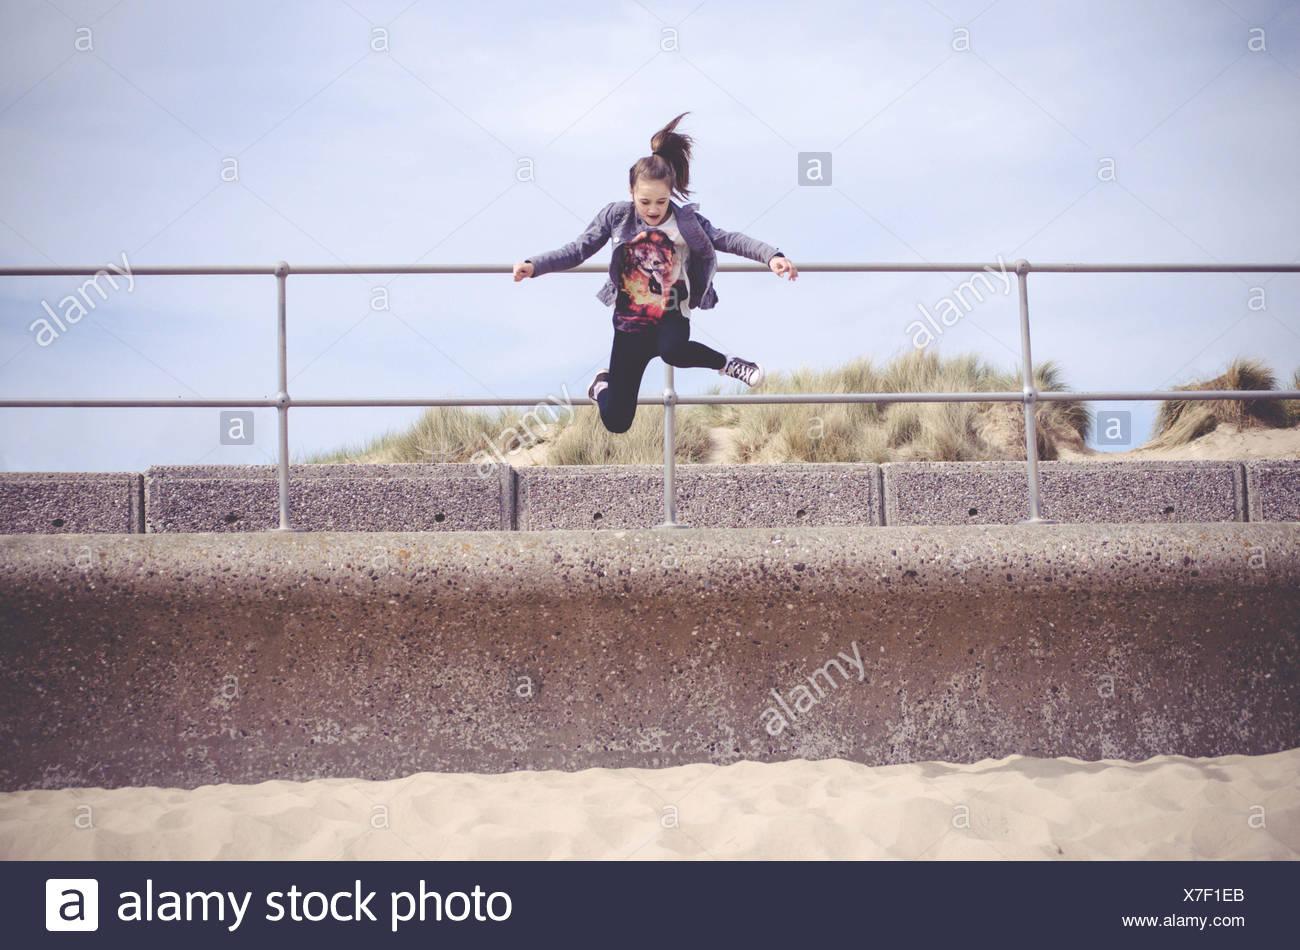 Girl jumping onto beach - Stock Image